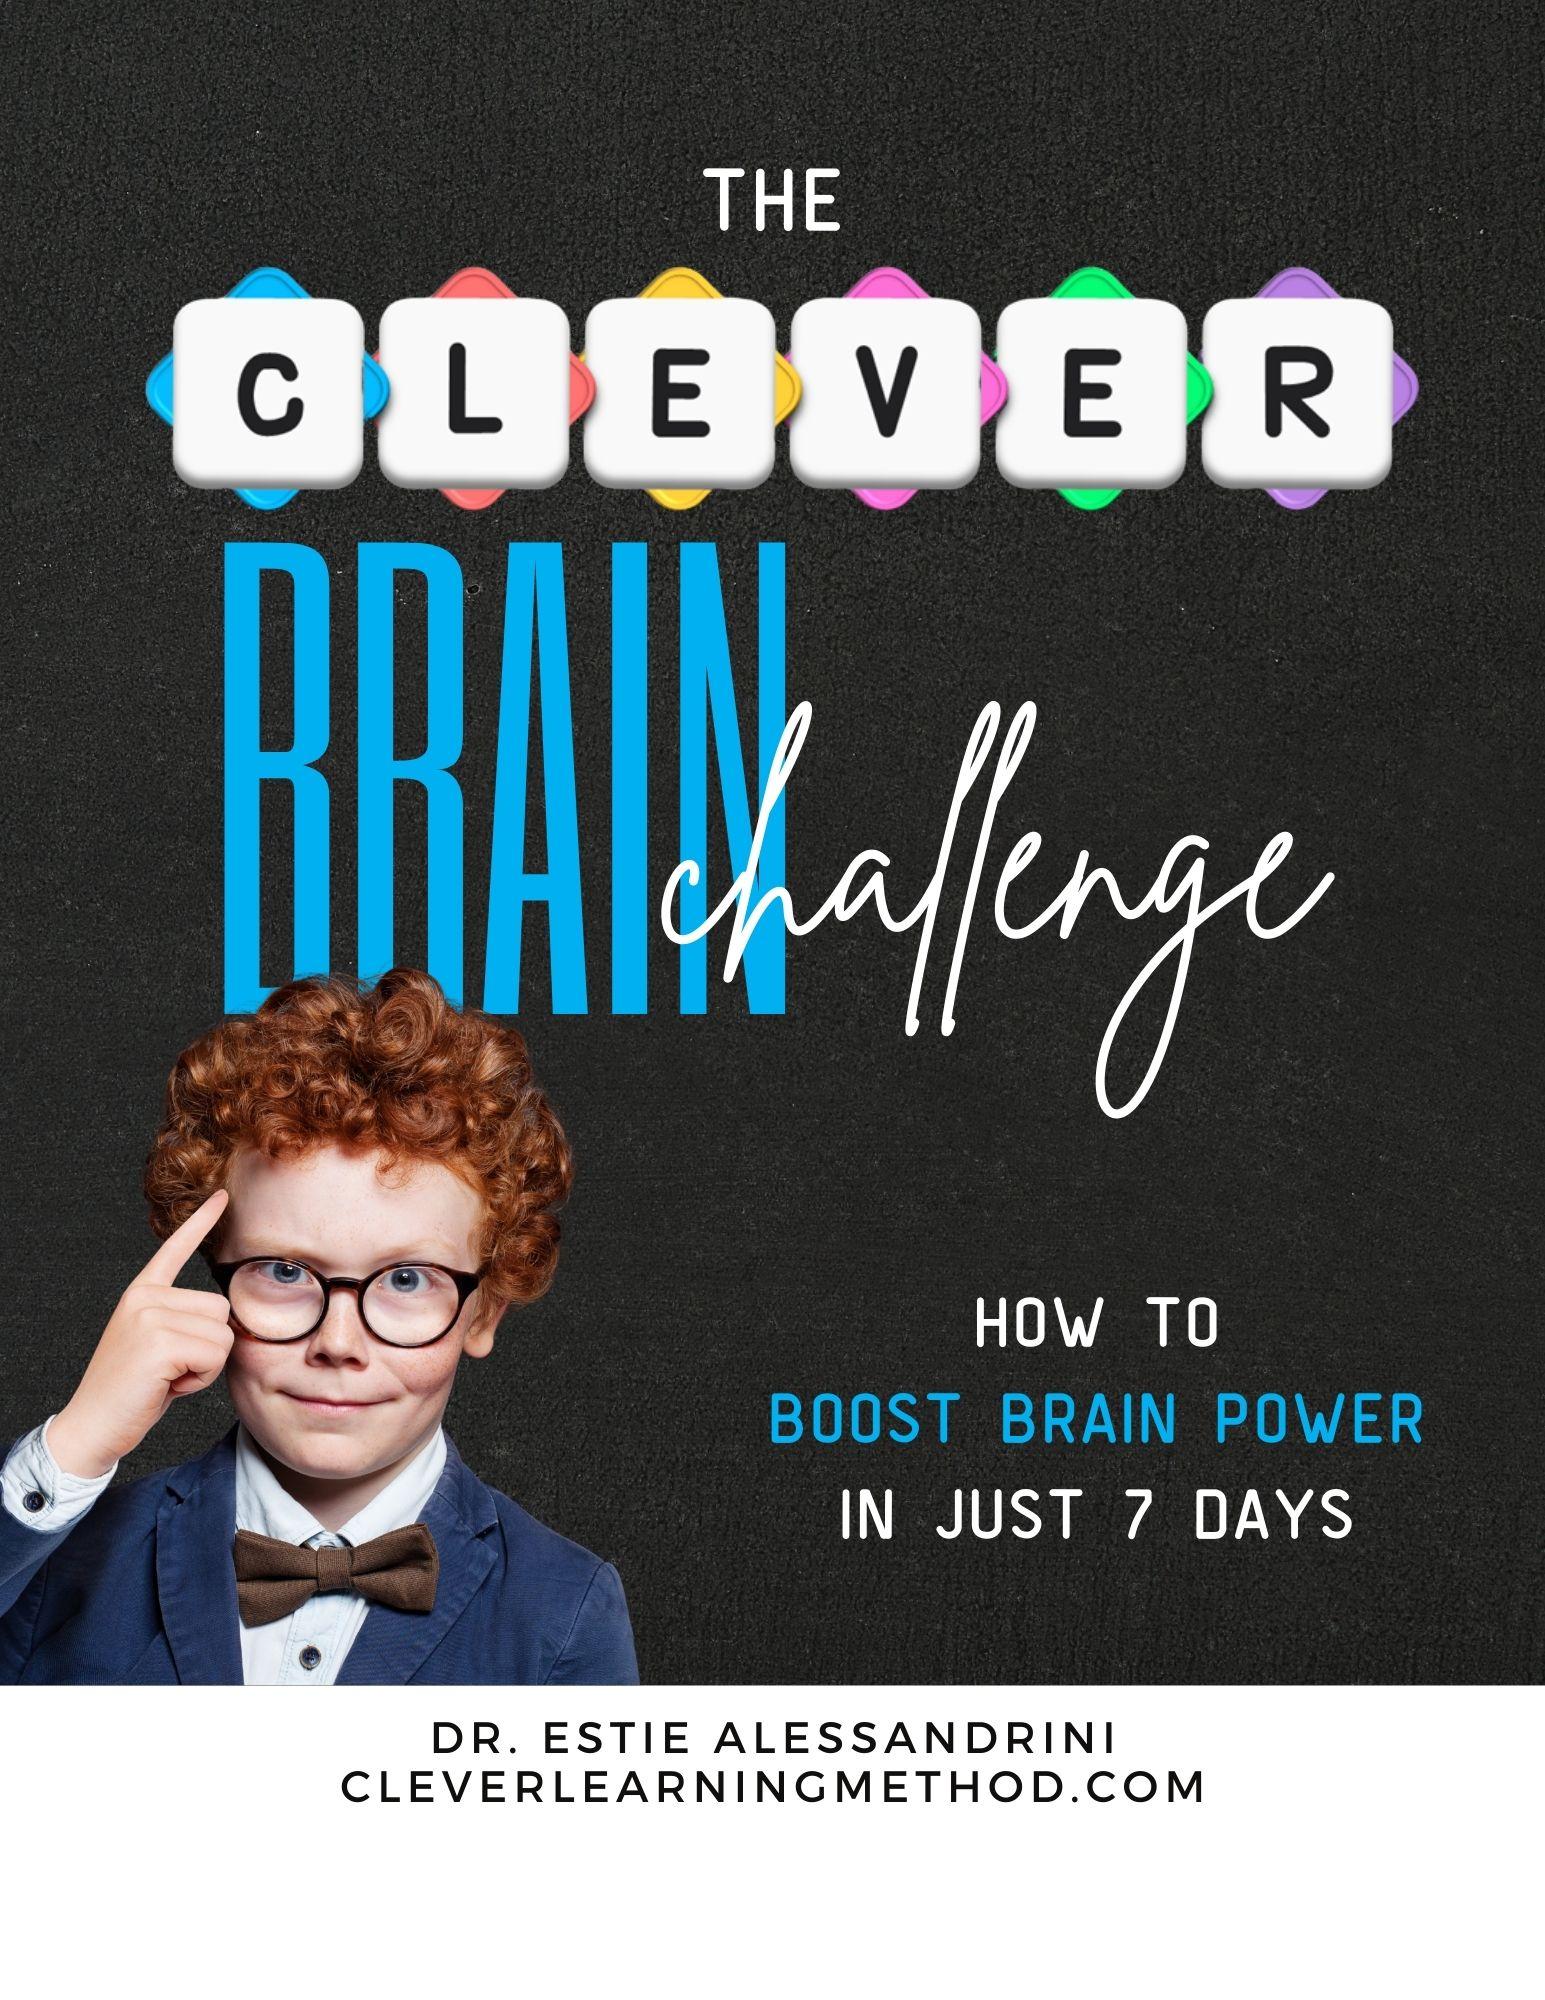 CLEVER brain challenge